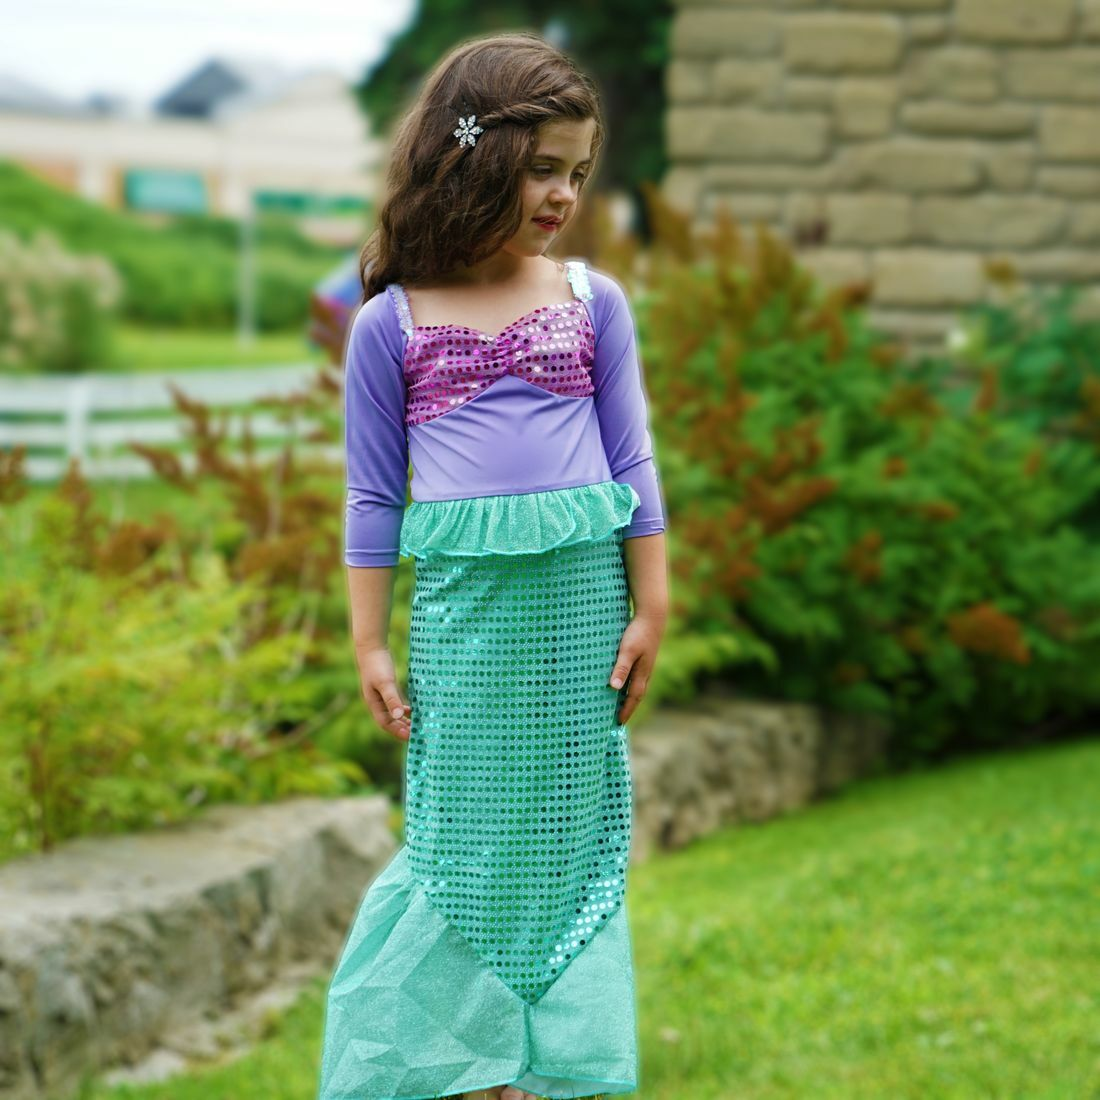 Mermaid Oceanus dress from Sara Dresses